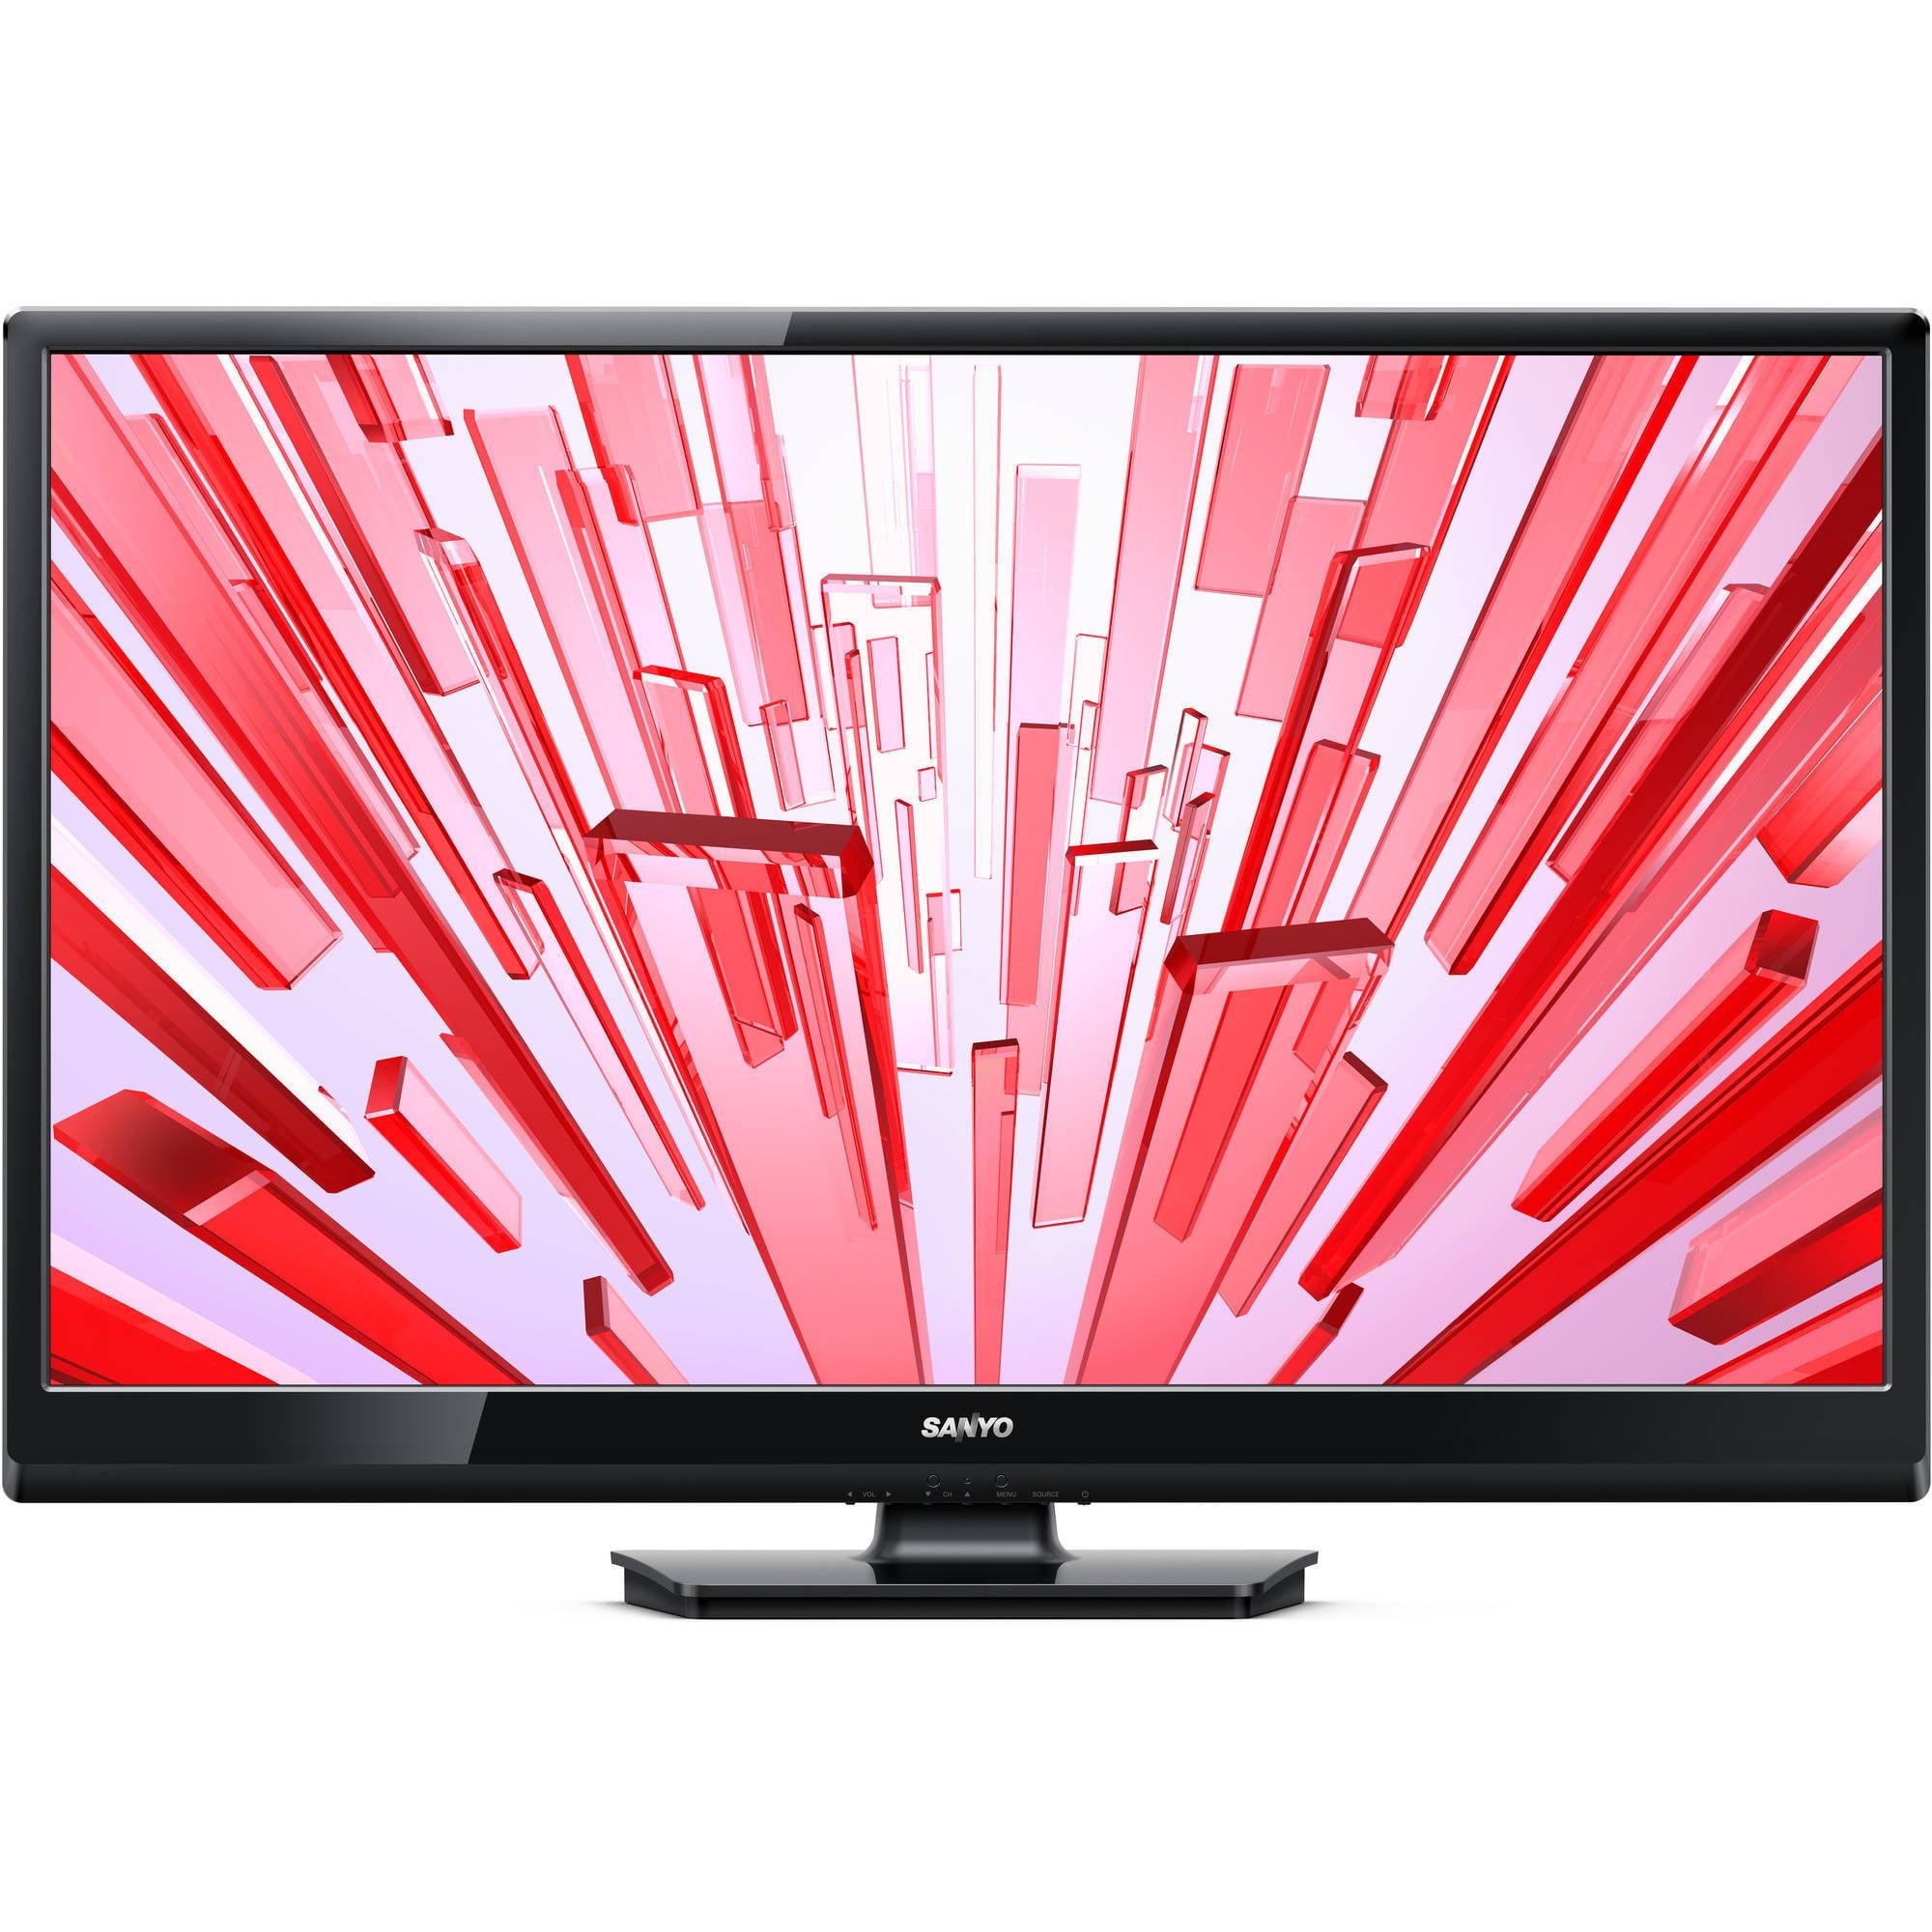 "Refurbished Sanyo FW32D06F 32"" 720p 60Hz LED LCD HDTV"